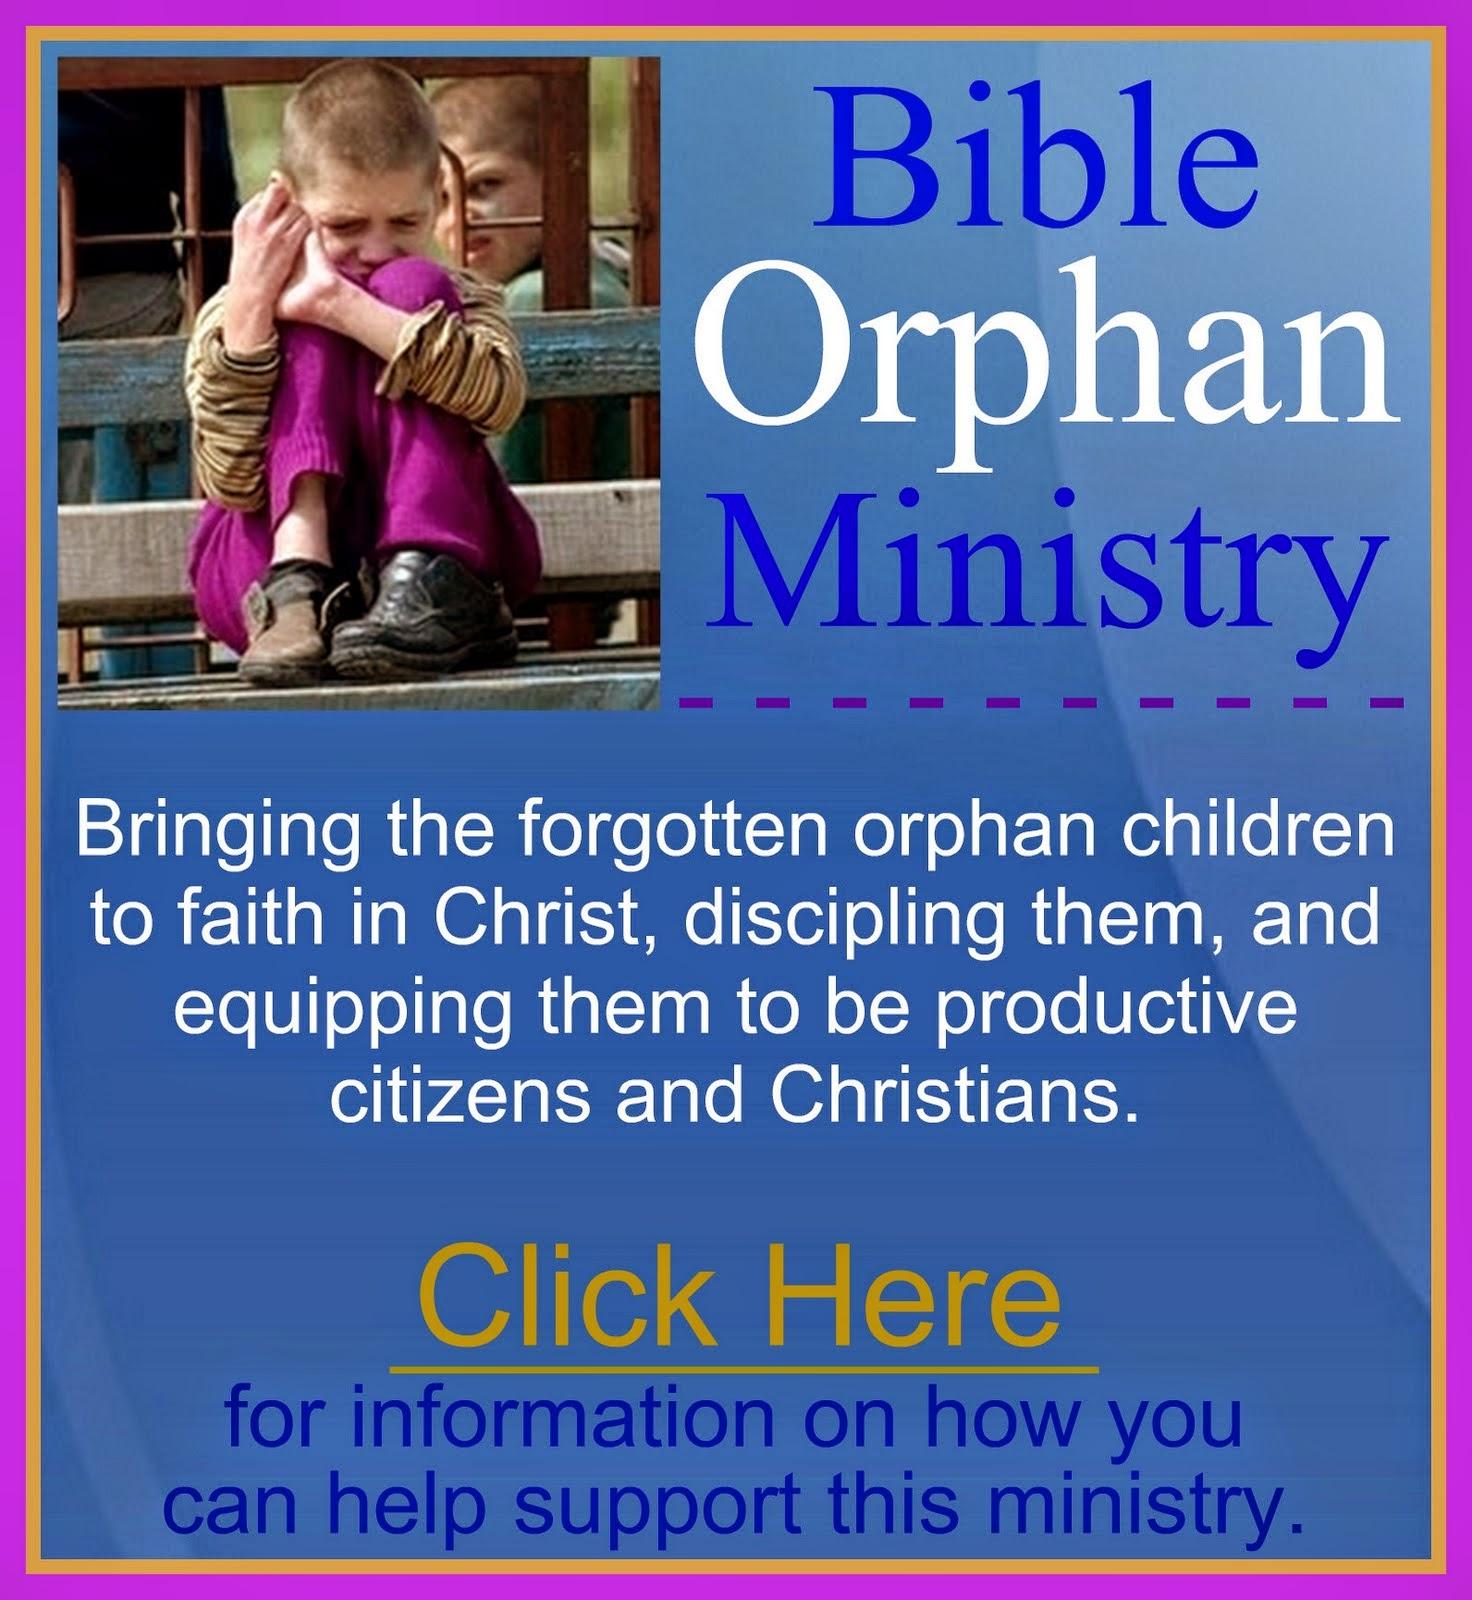 bibleorphanministry.blogspot.com